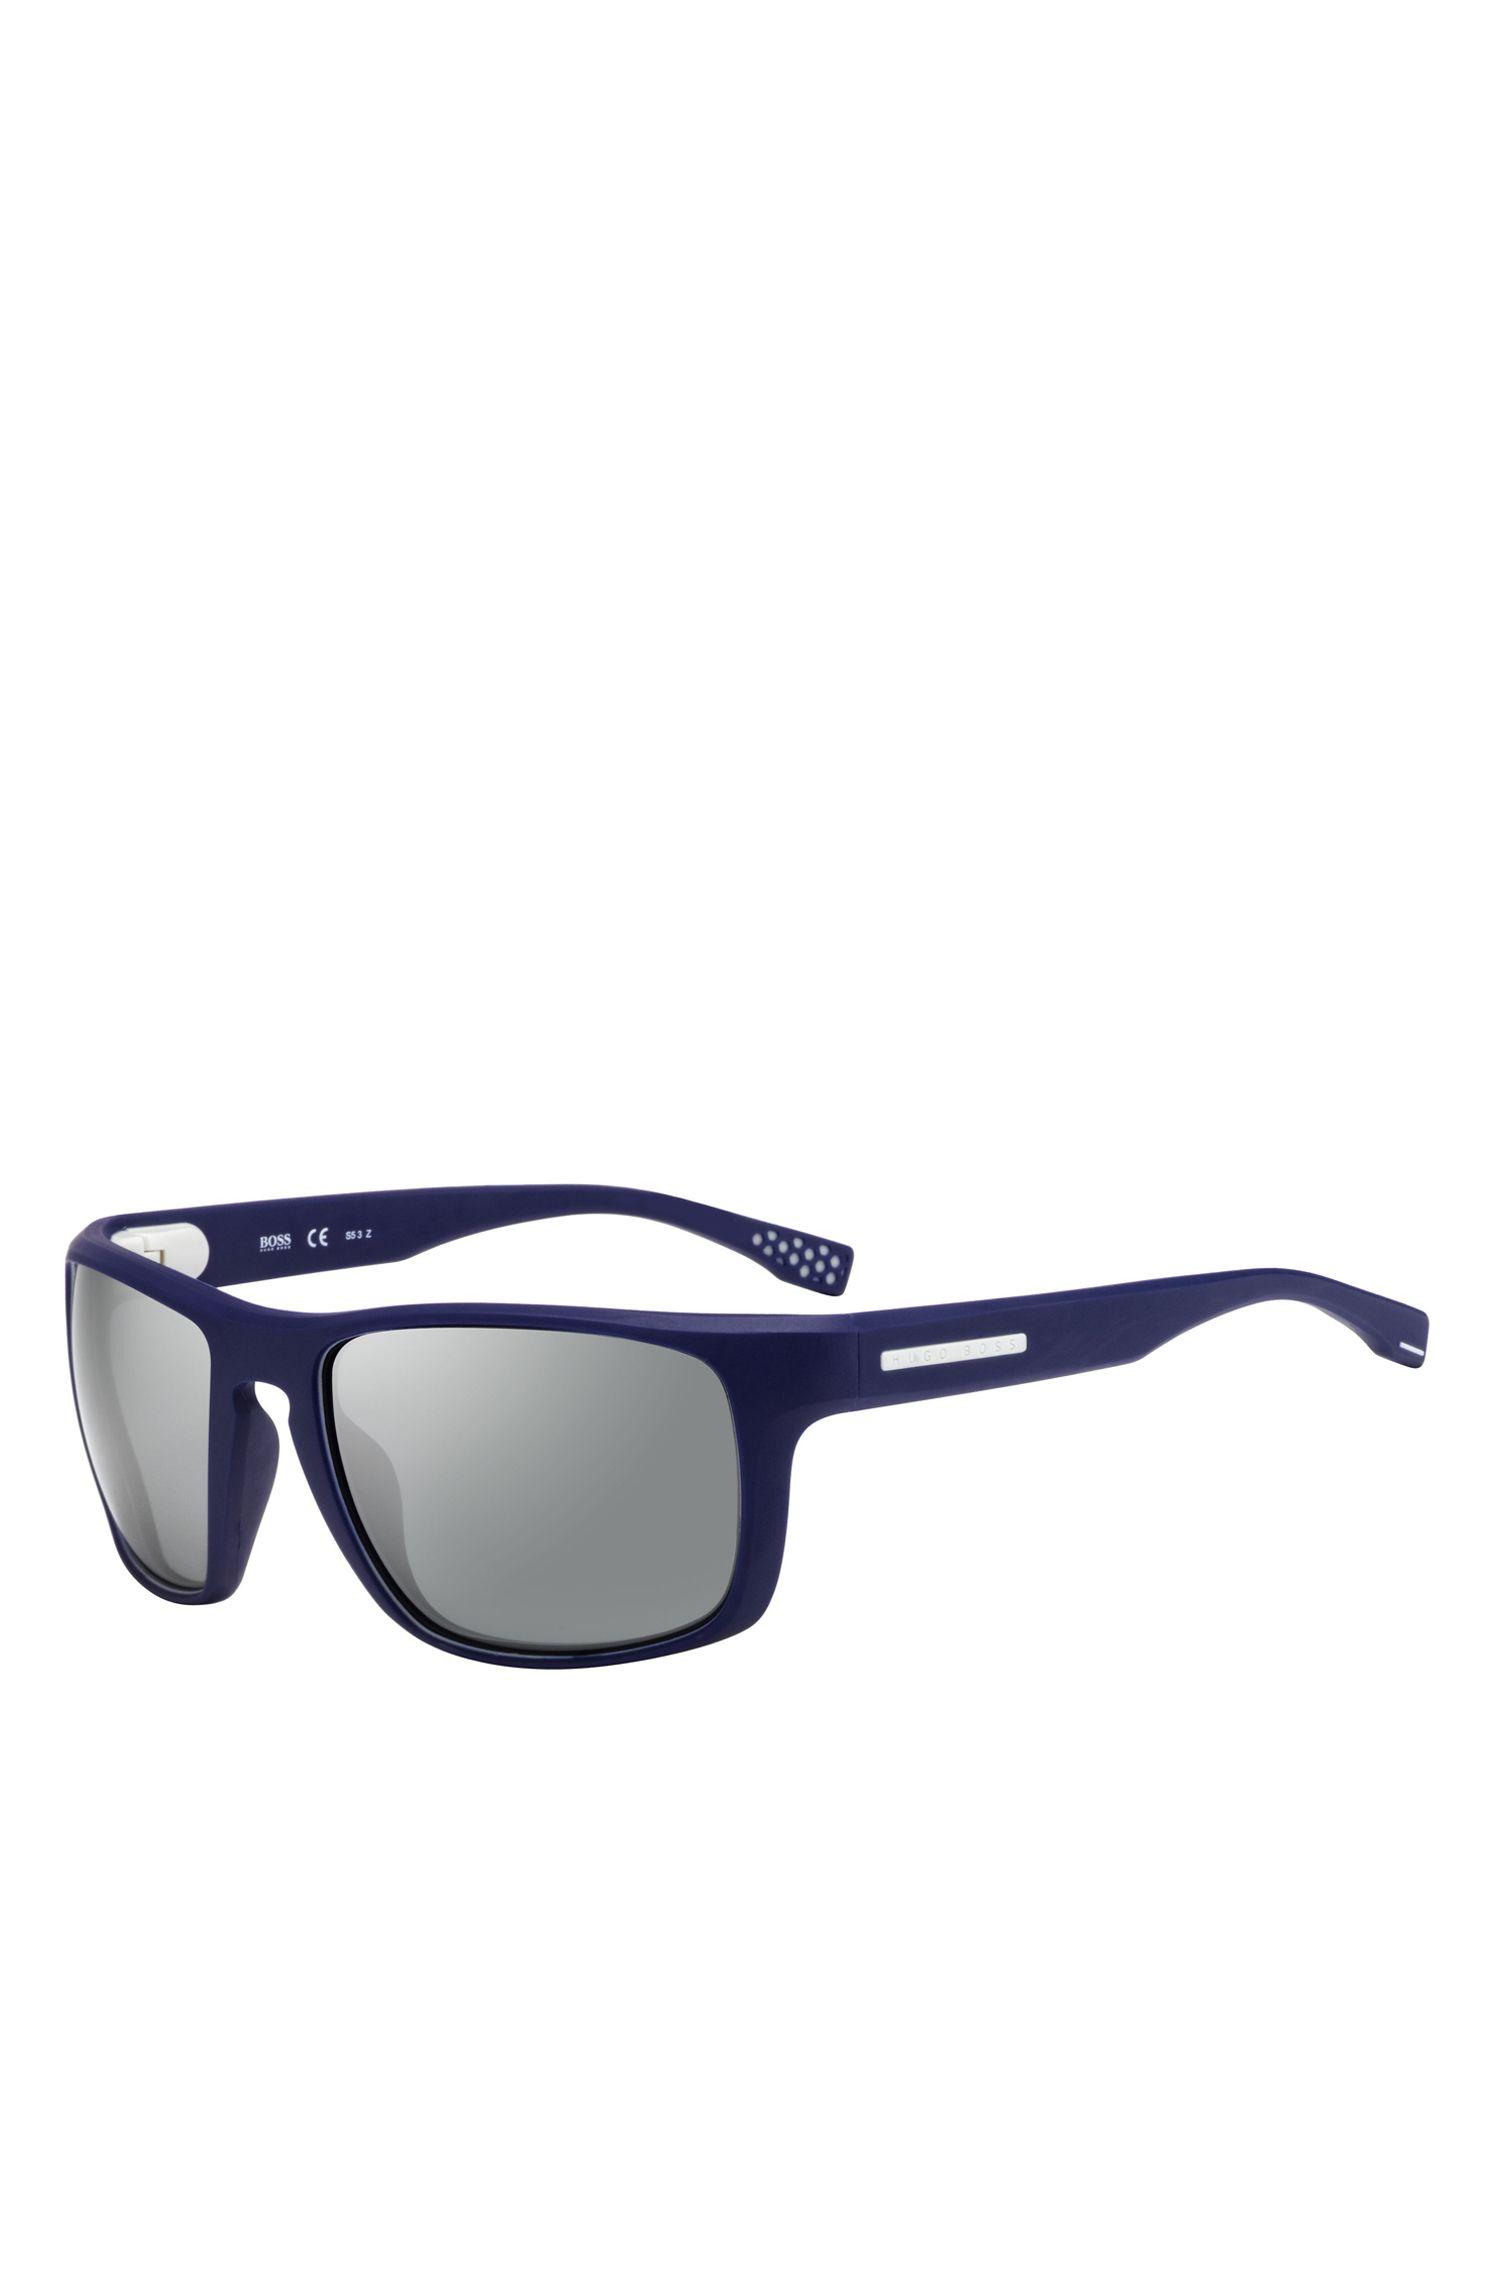 Mirror Lens Water Repellent Rectangular Sunglasses | BOSS 0800S